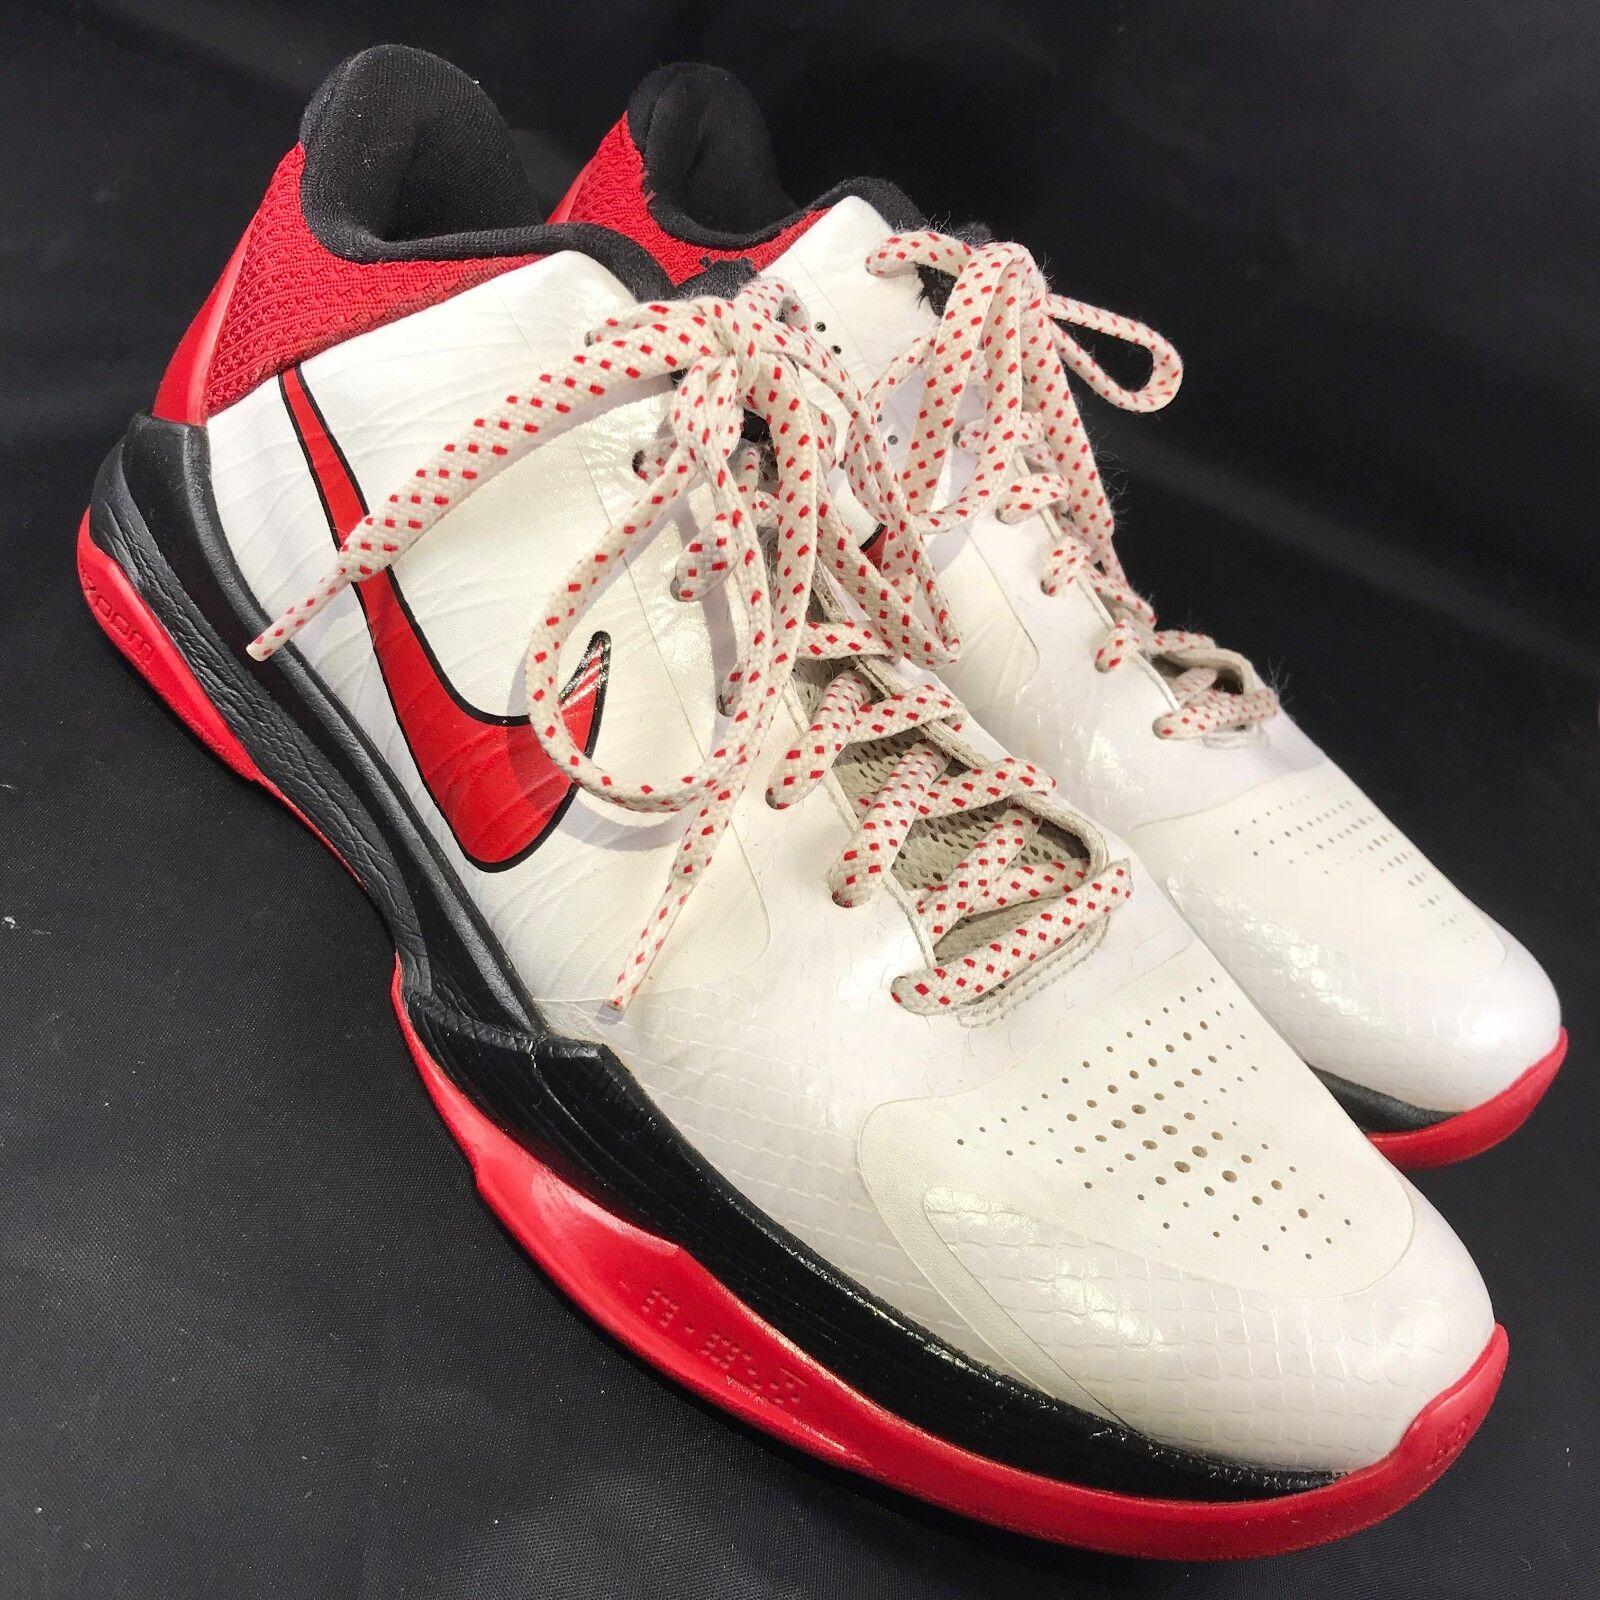 2018 Nike Zoom Kobe V 5 Valentines Day White Red Black 386429-161 US 8 41 EUR